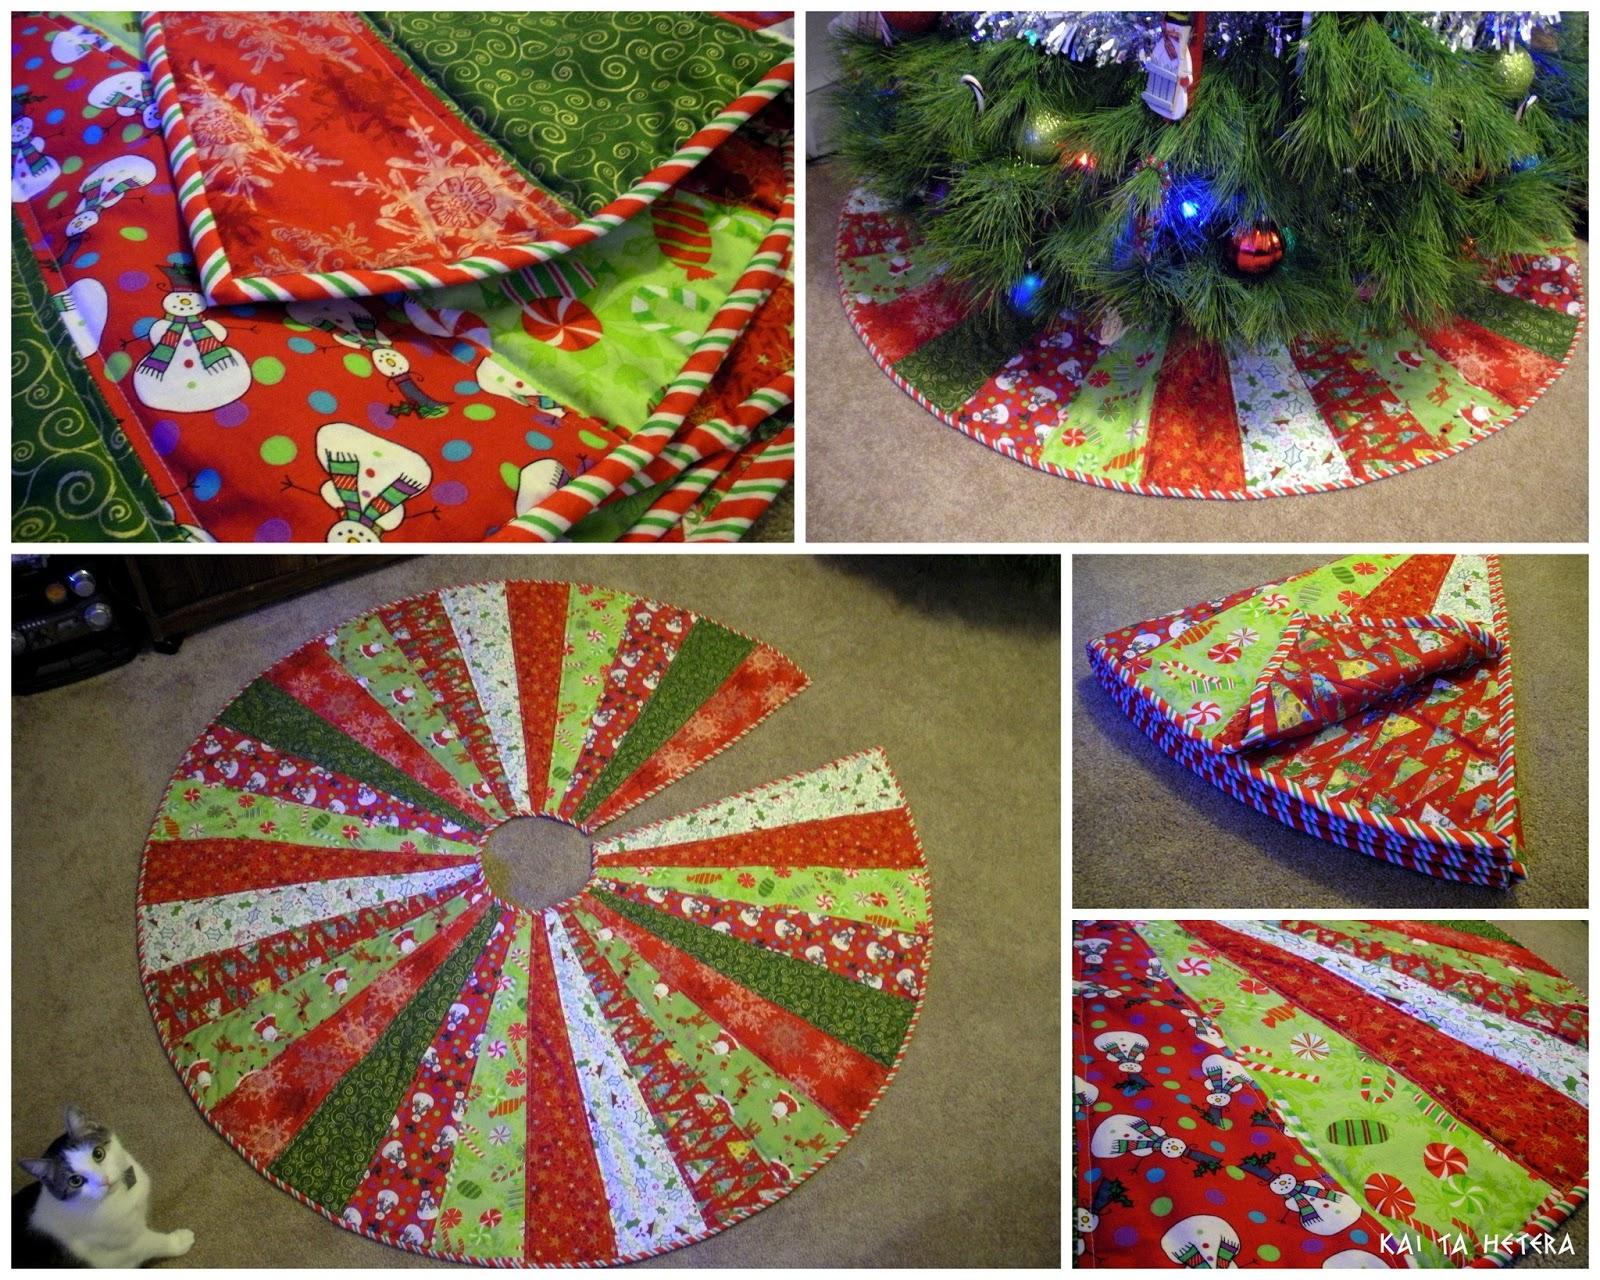 kai ta hetera quilted christmas tree skirt. Black Bedroom Furniture Sets. Home Design Ideas